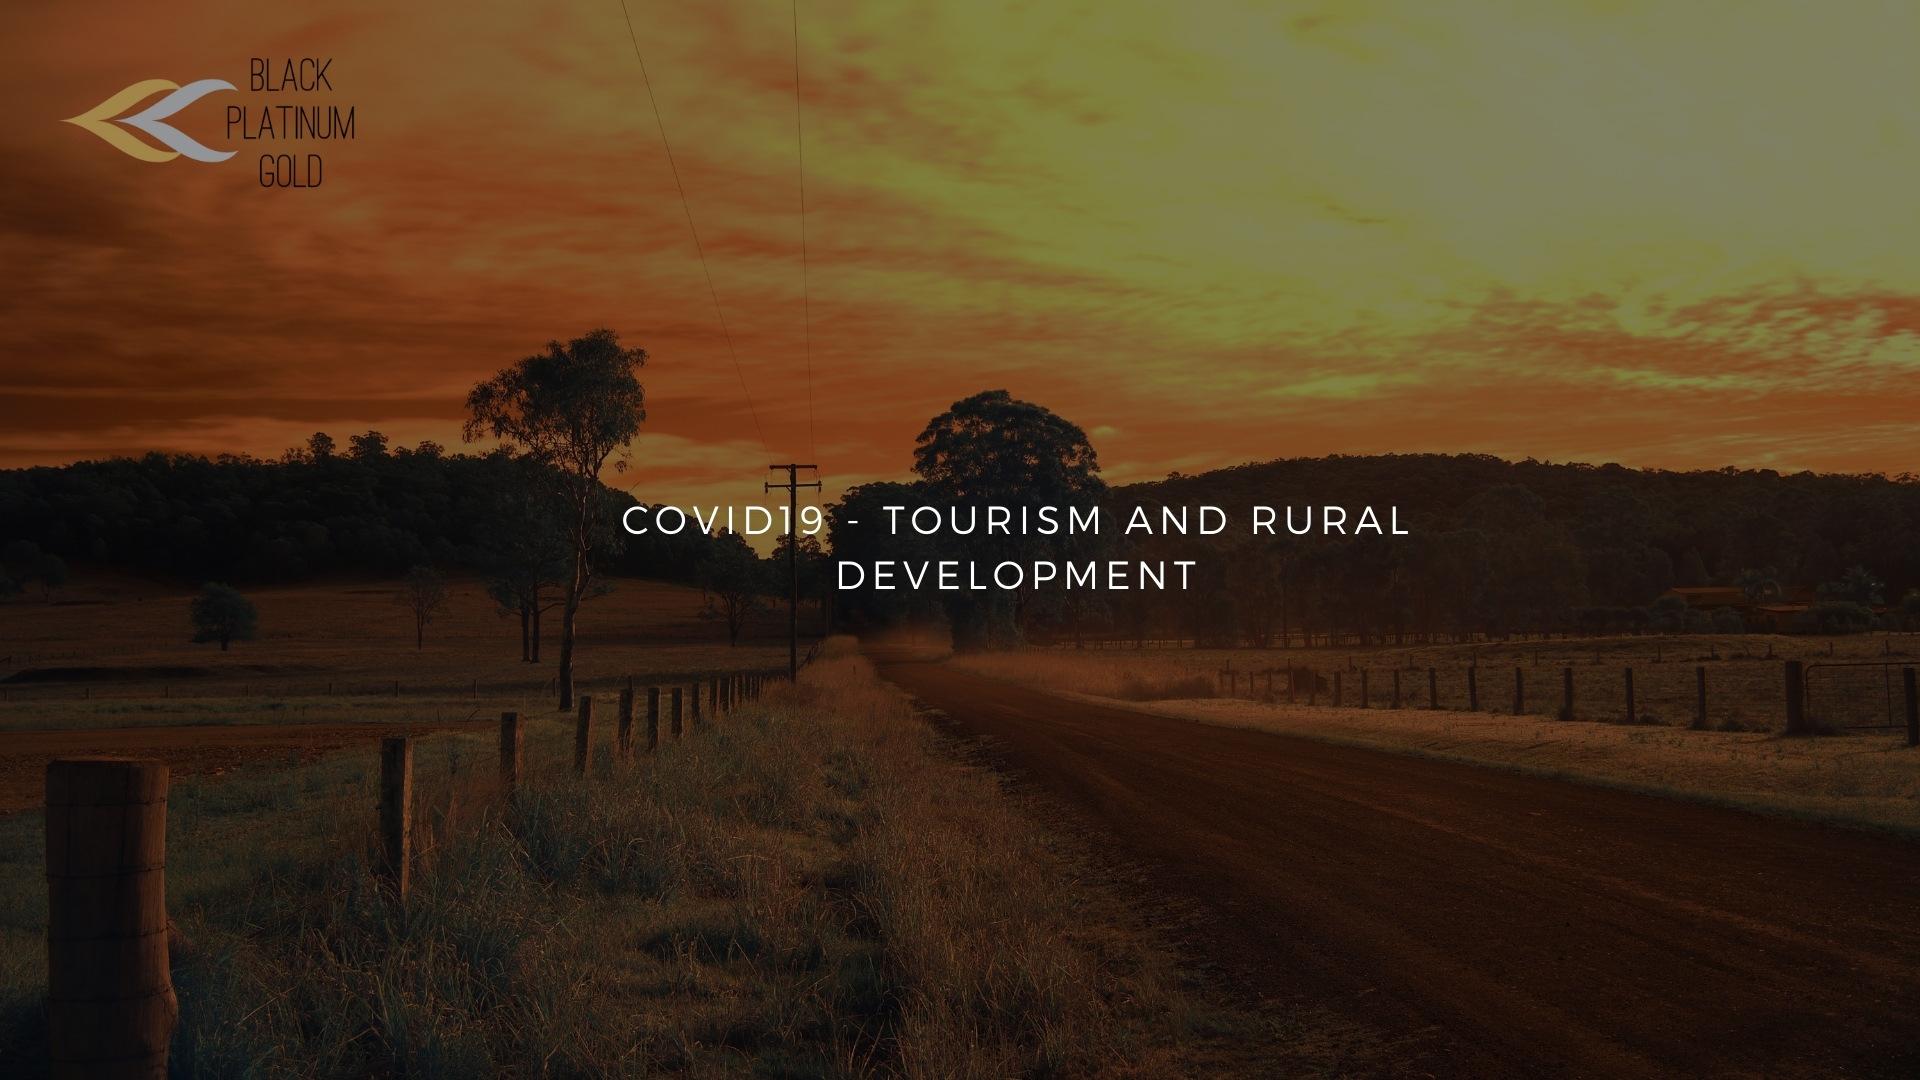 COVID19 - Tourism and Rural Development - black platinum gold